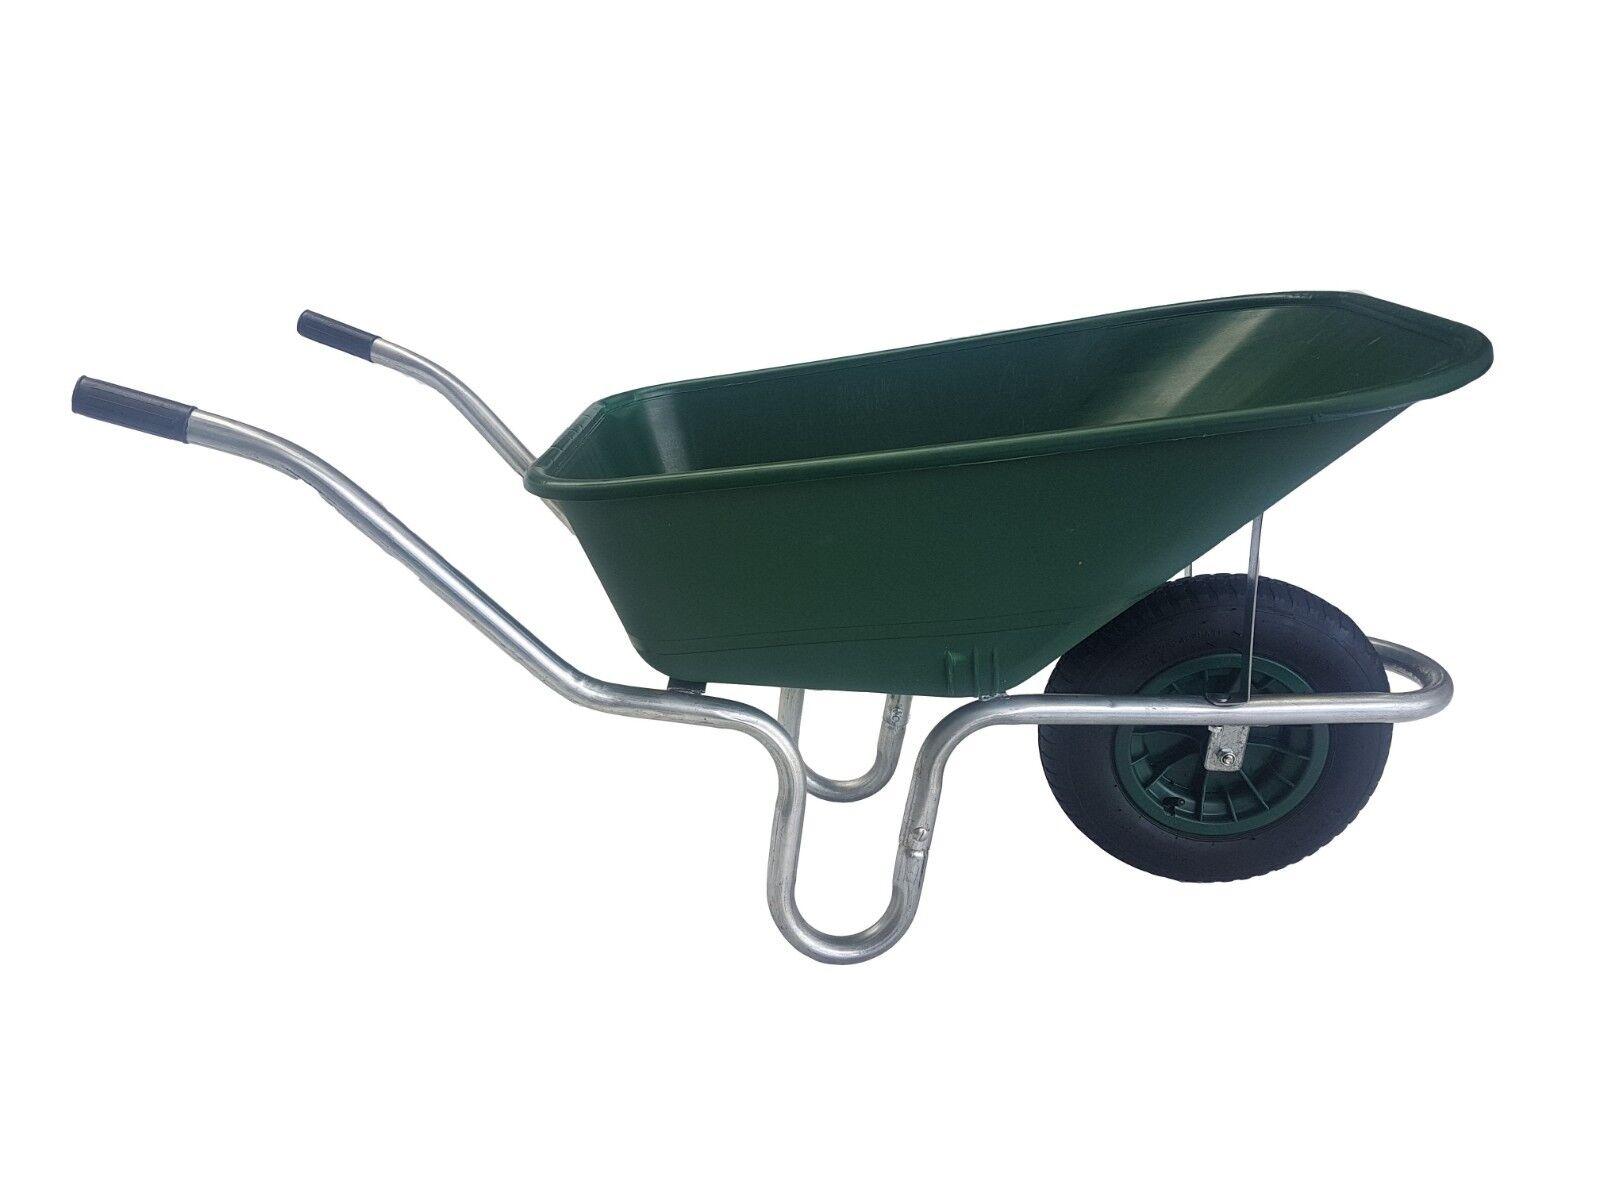 110 Litre GREEN WHEELBARROW Garden Equestrian Wheel Barrow  PNEUMATIC Wheel 110L